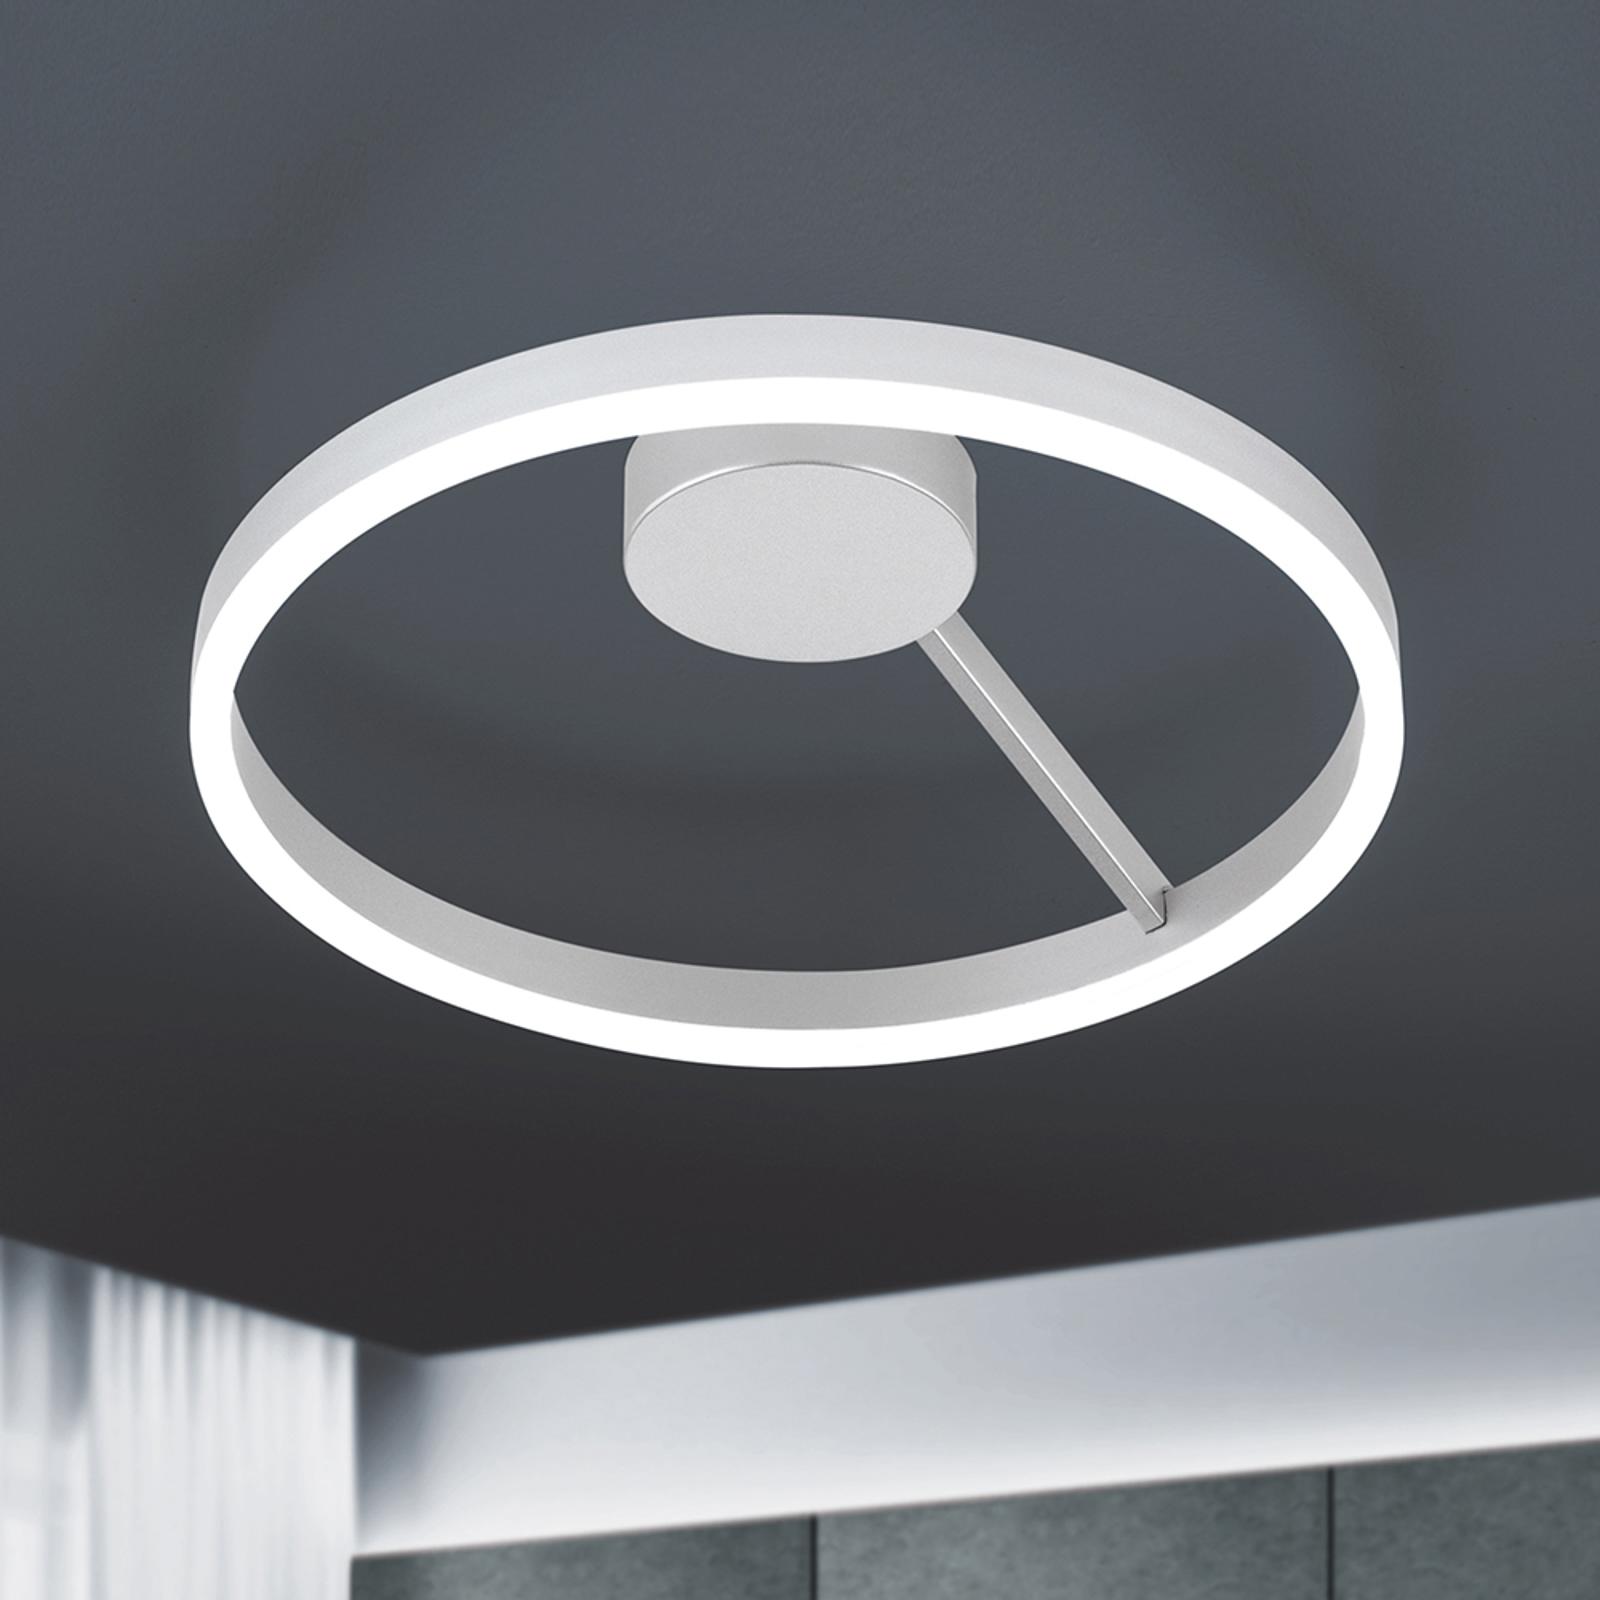 LED-kattovalaisin Robert Ø 40 cm